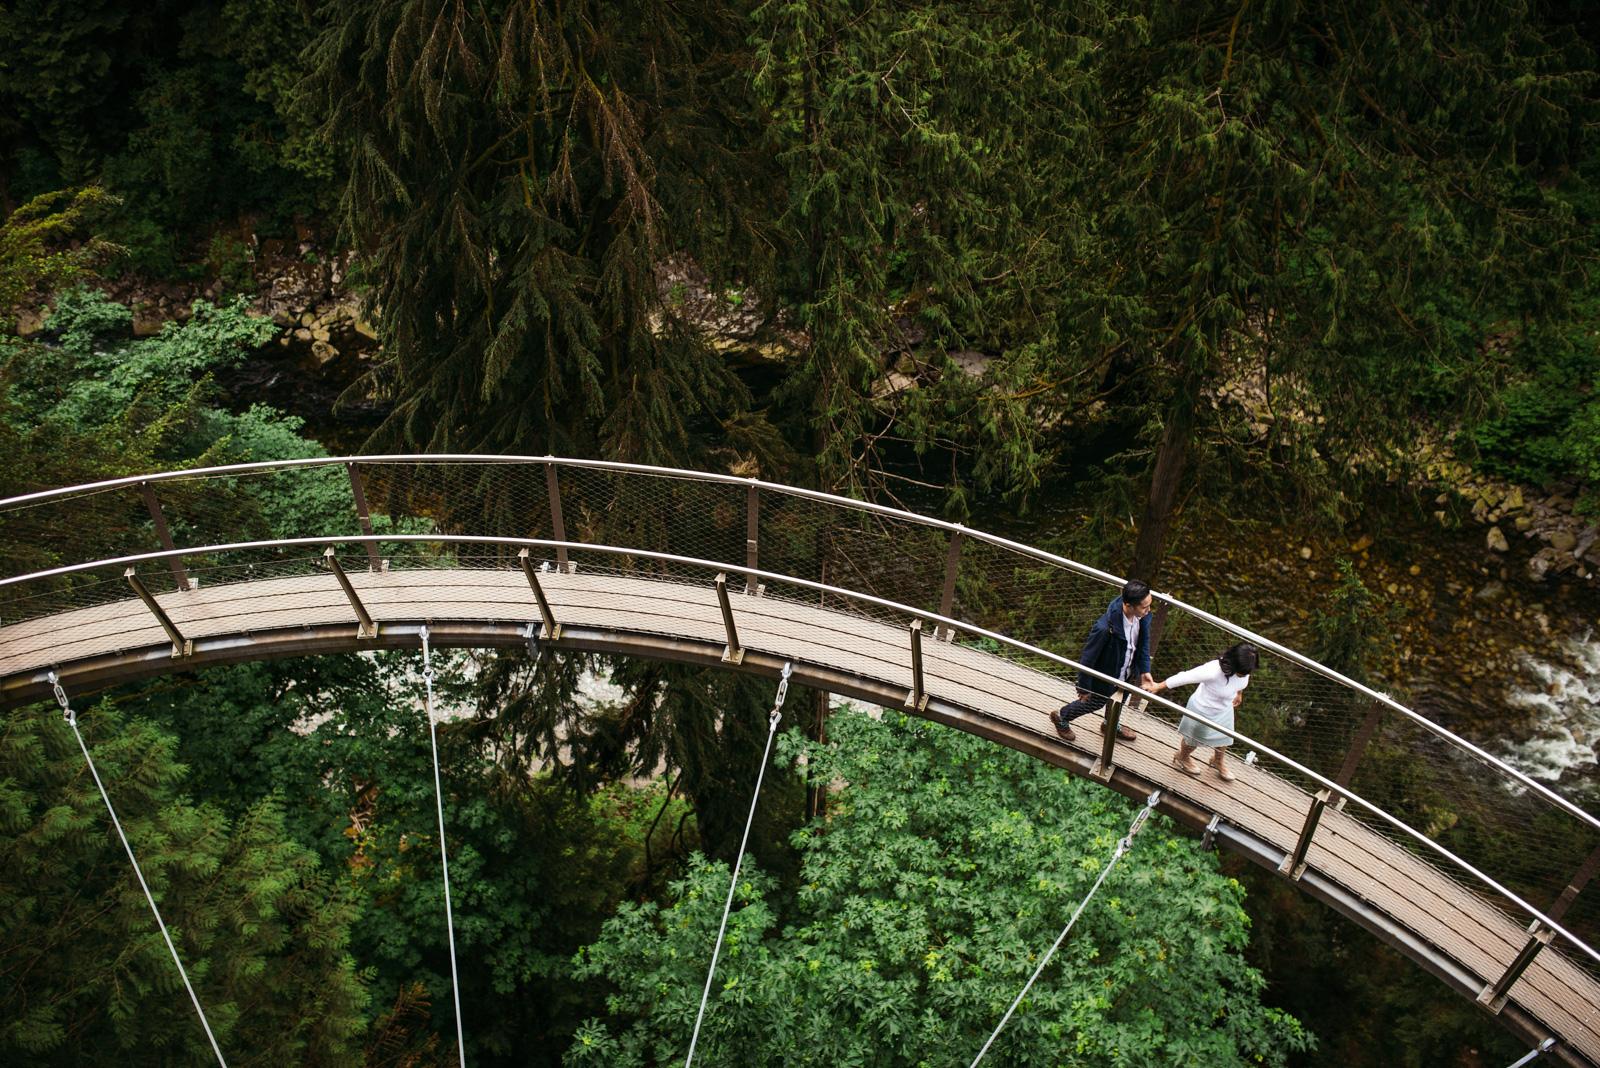 vancouver-island-wedding-photographers-capilano-suspension-bridge-engagement-3.jpg